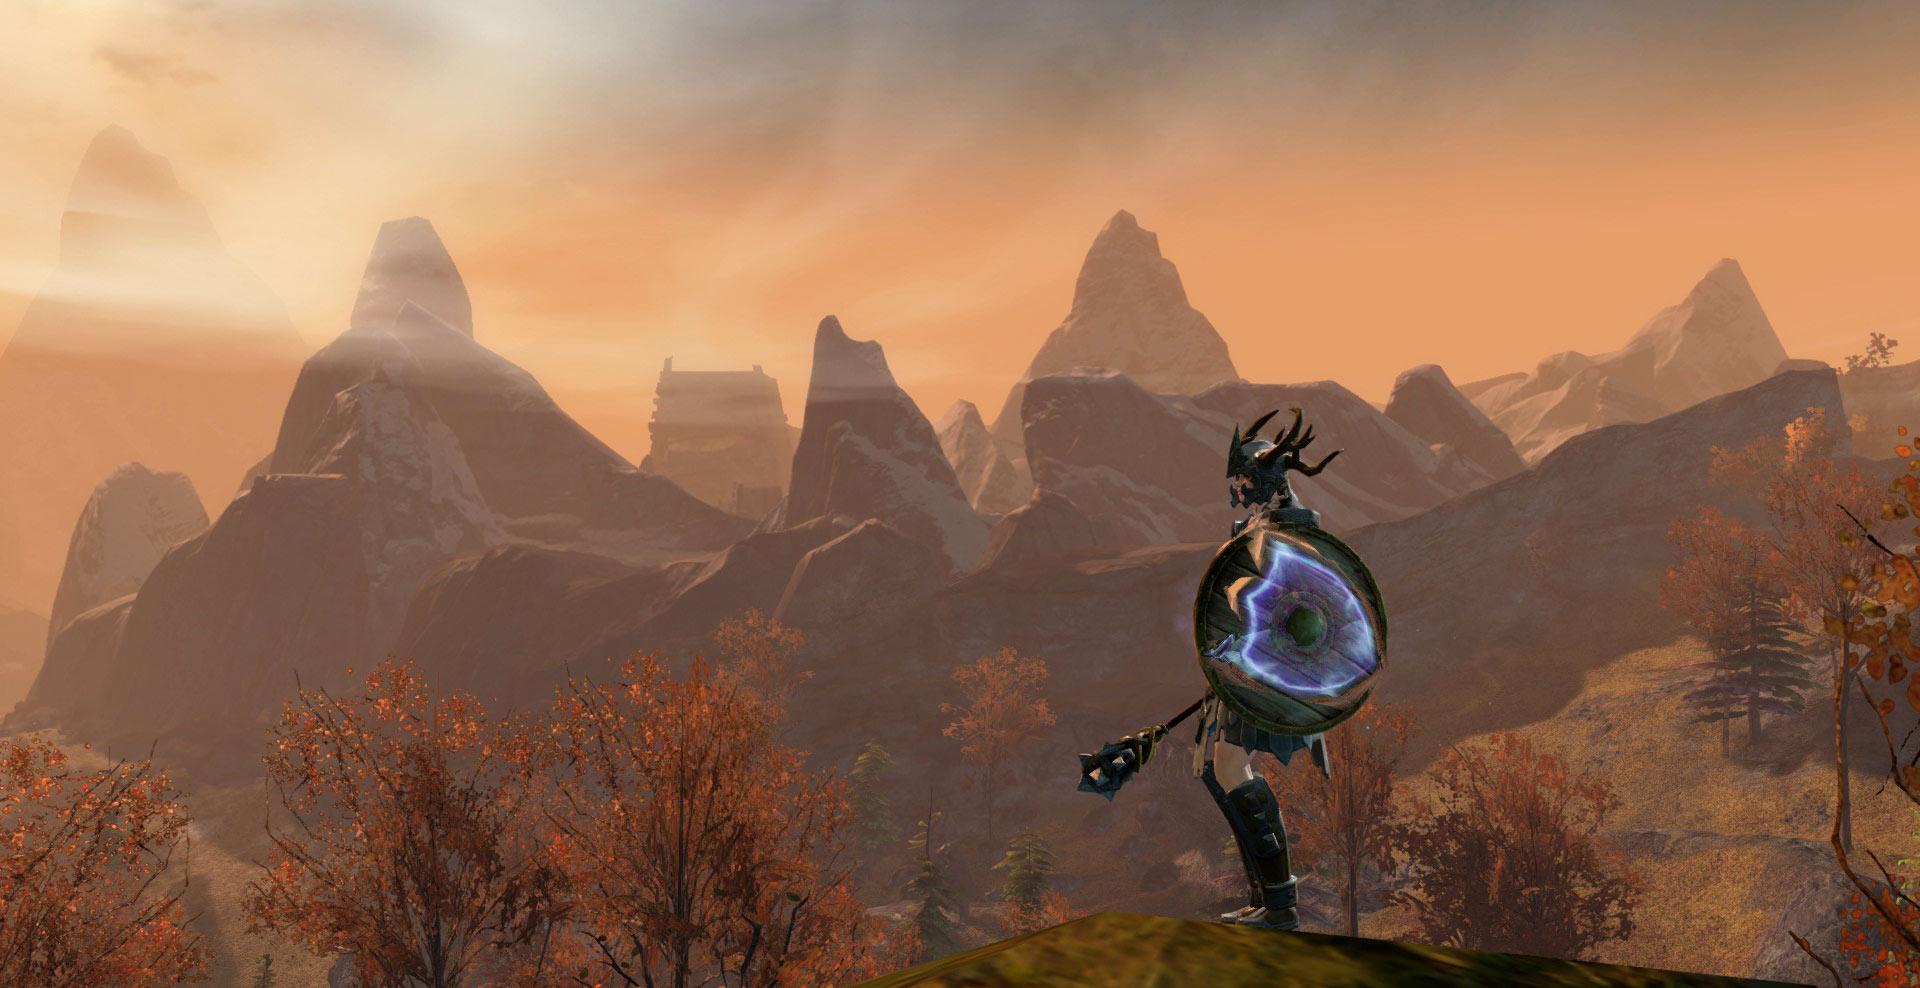 Tres das ms para probar guild wars 2 hobbyconsolas juegos tres das ms para probar guild wars 2 malvernweather Choice Image